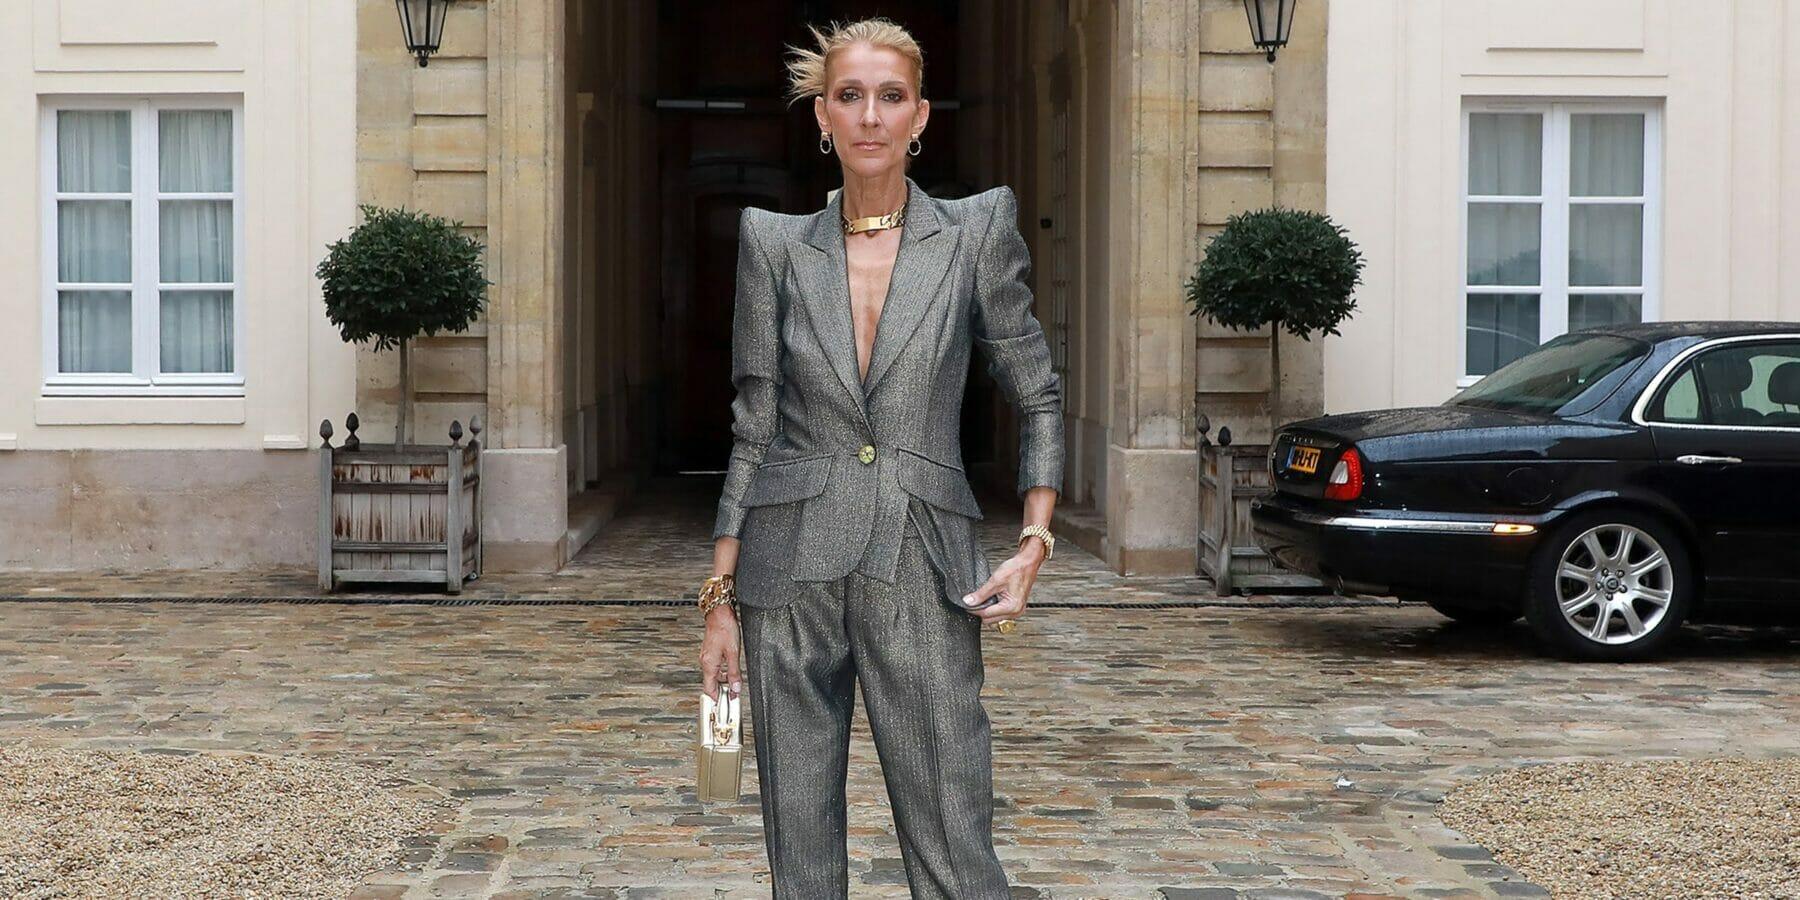 Celine Dion's new look